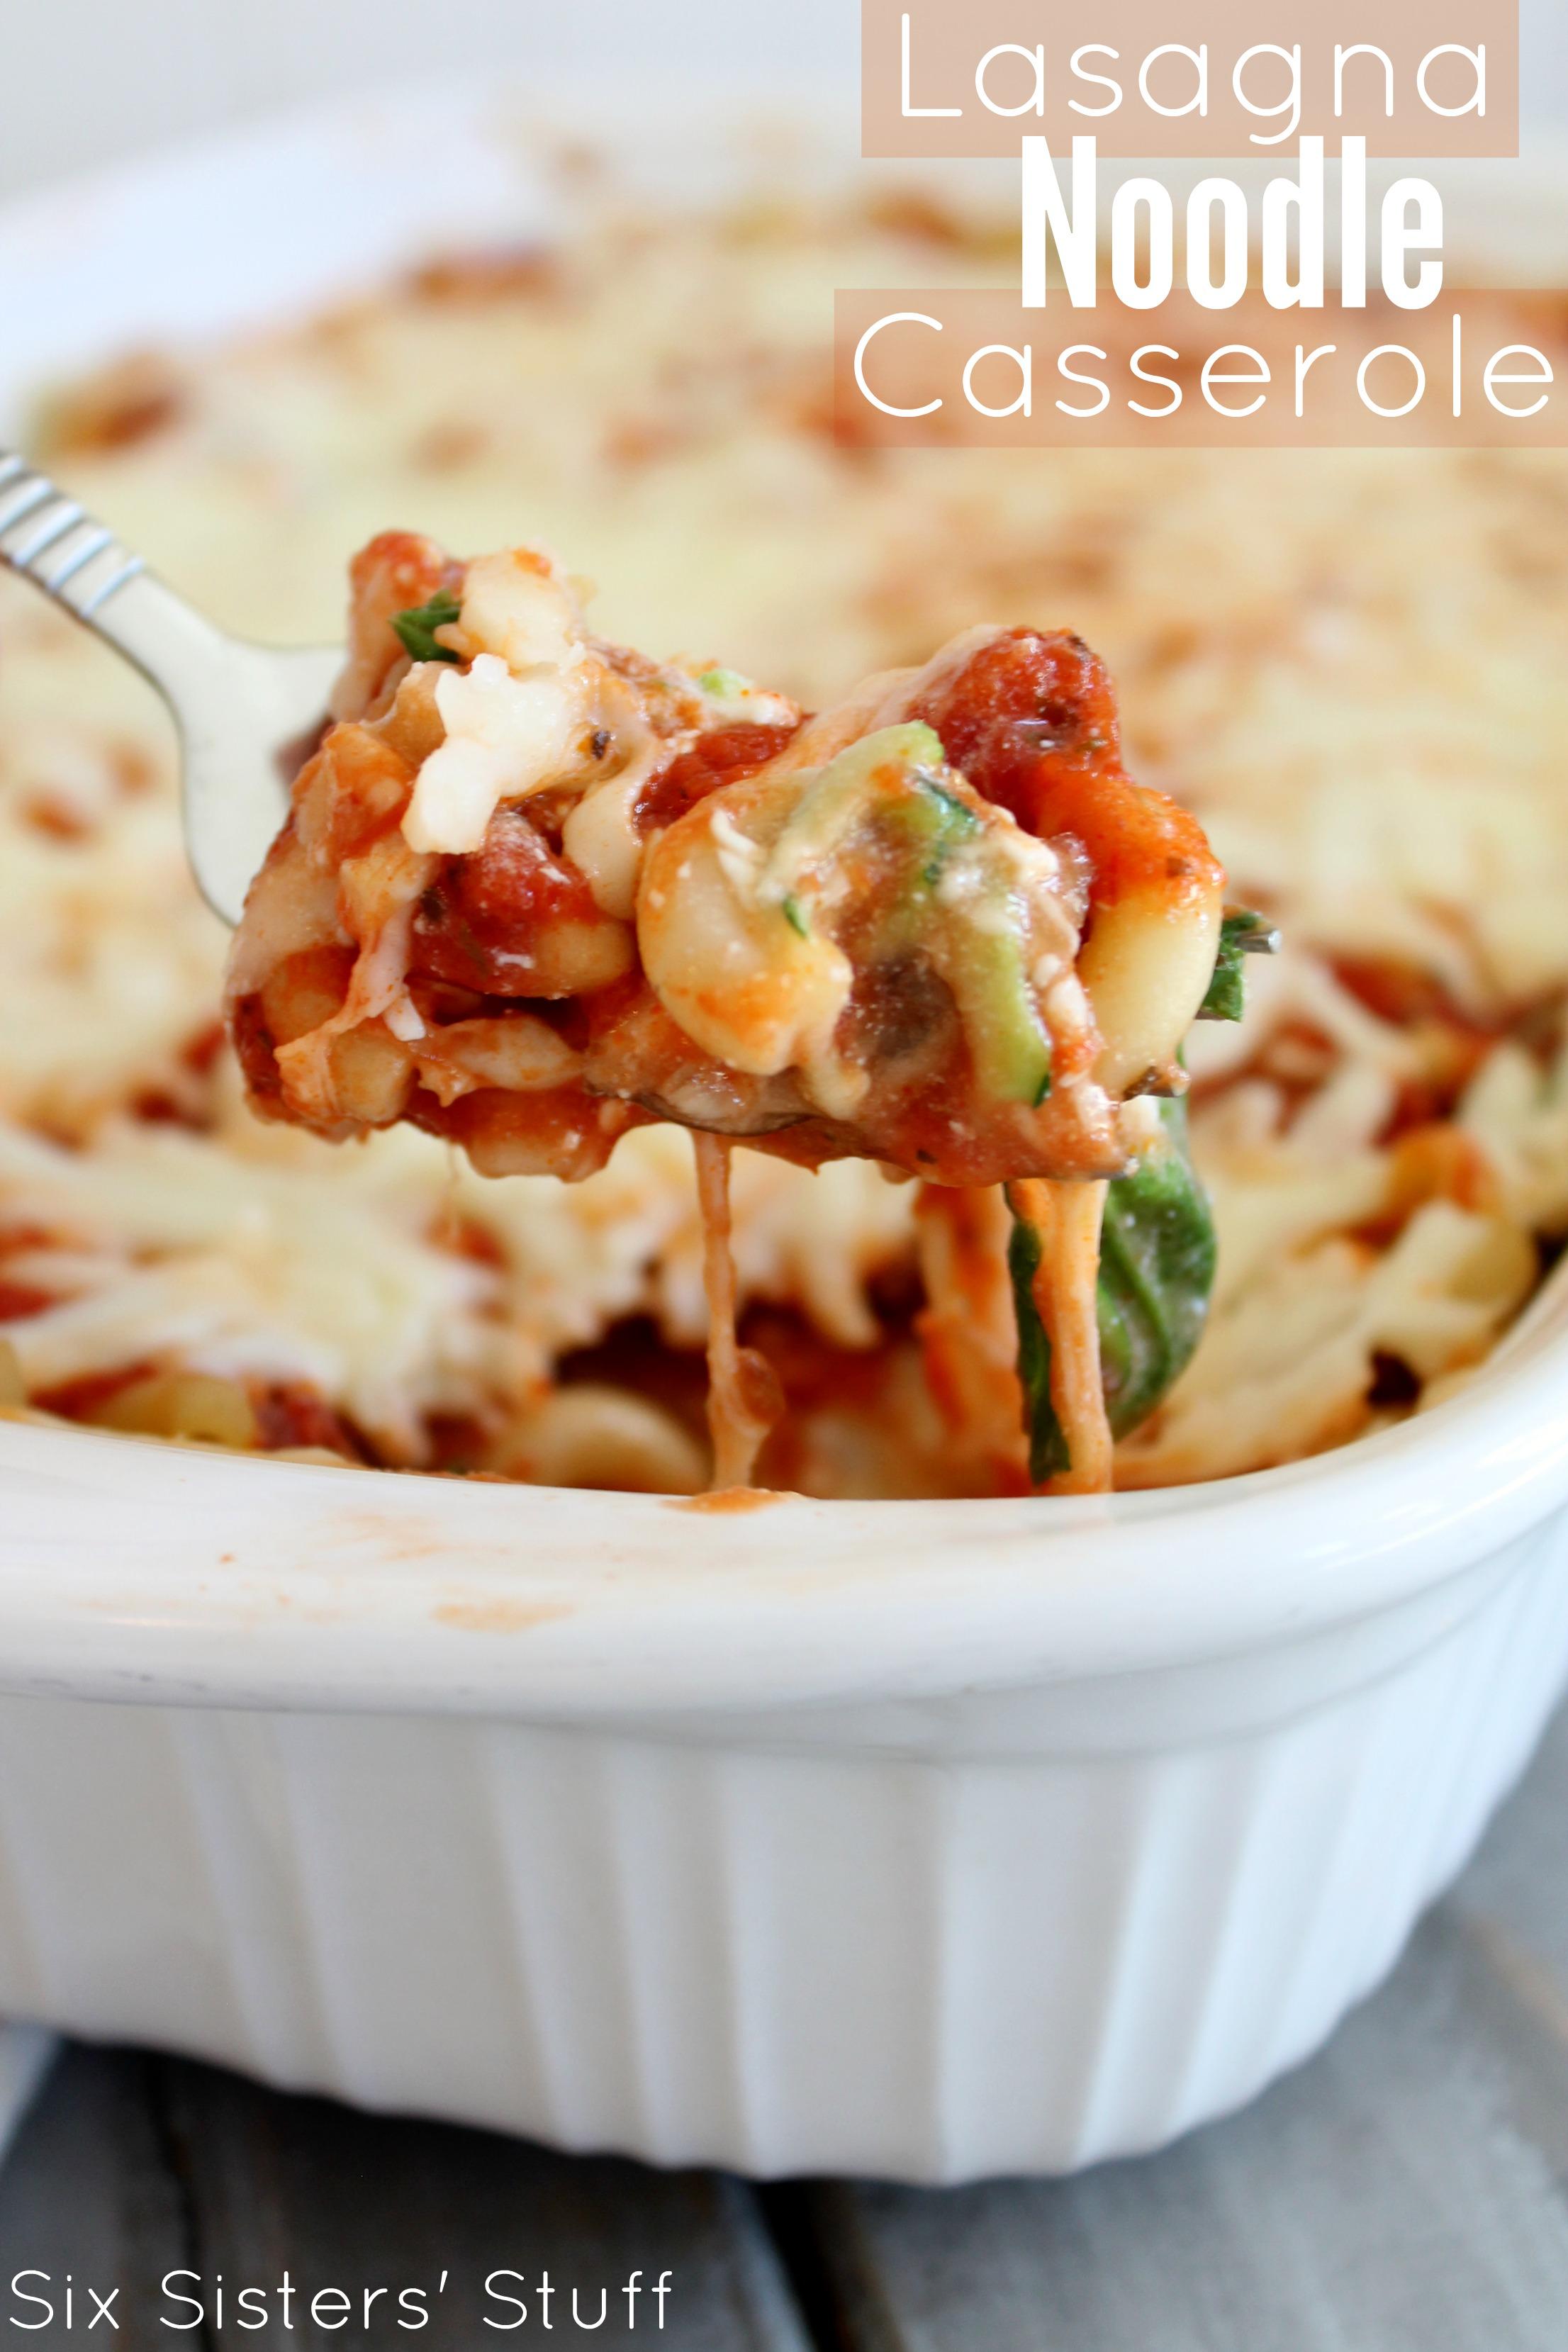 Lasagna Noodle Casserole